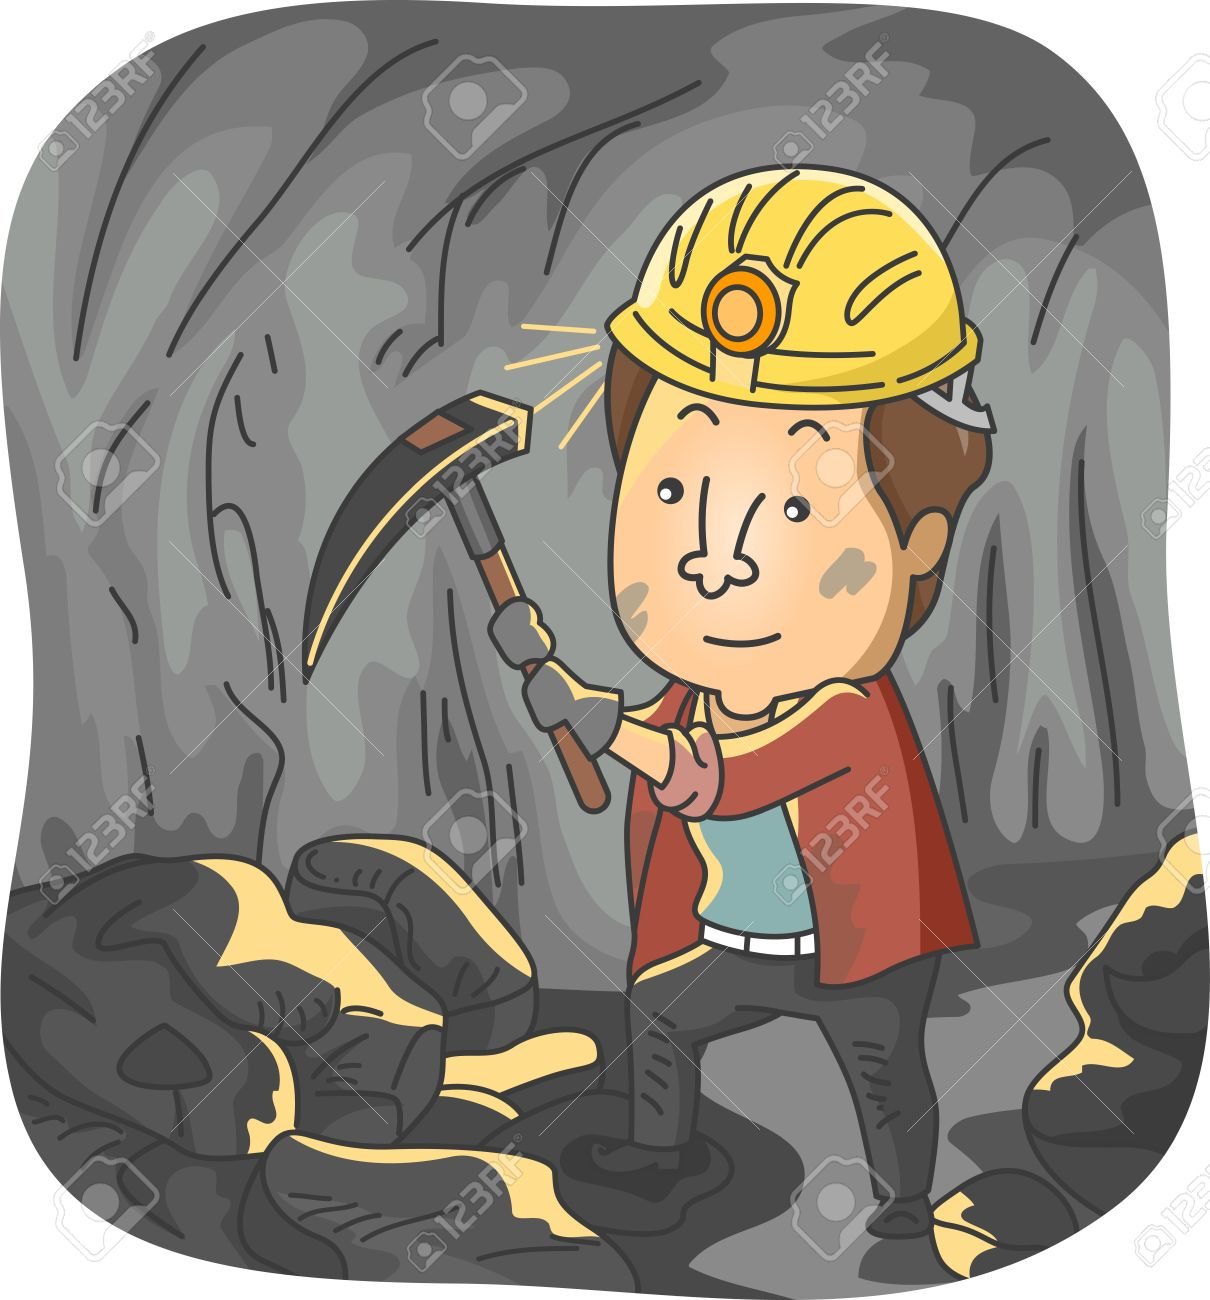 Illustration Featuring a Man Mining Coal.